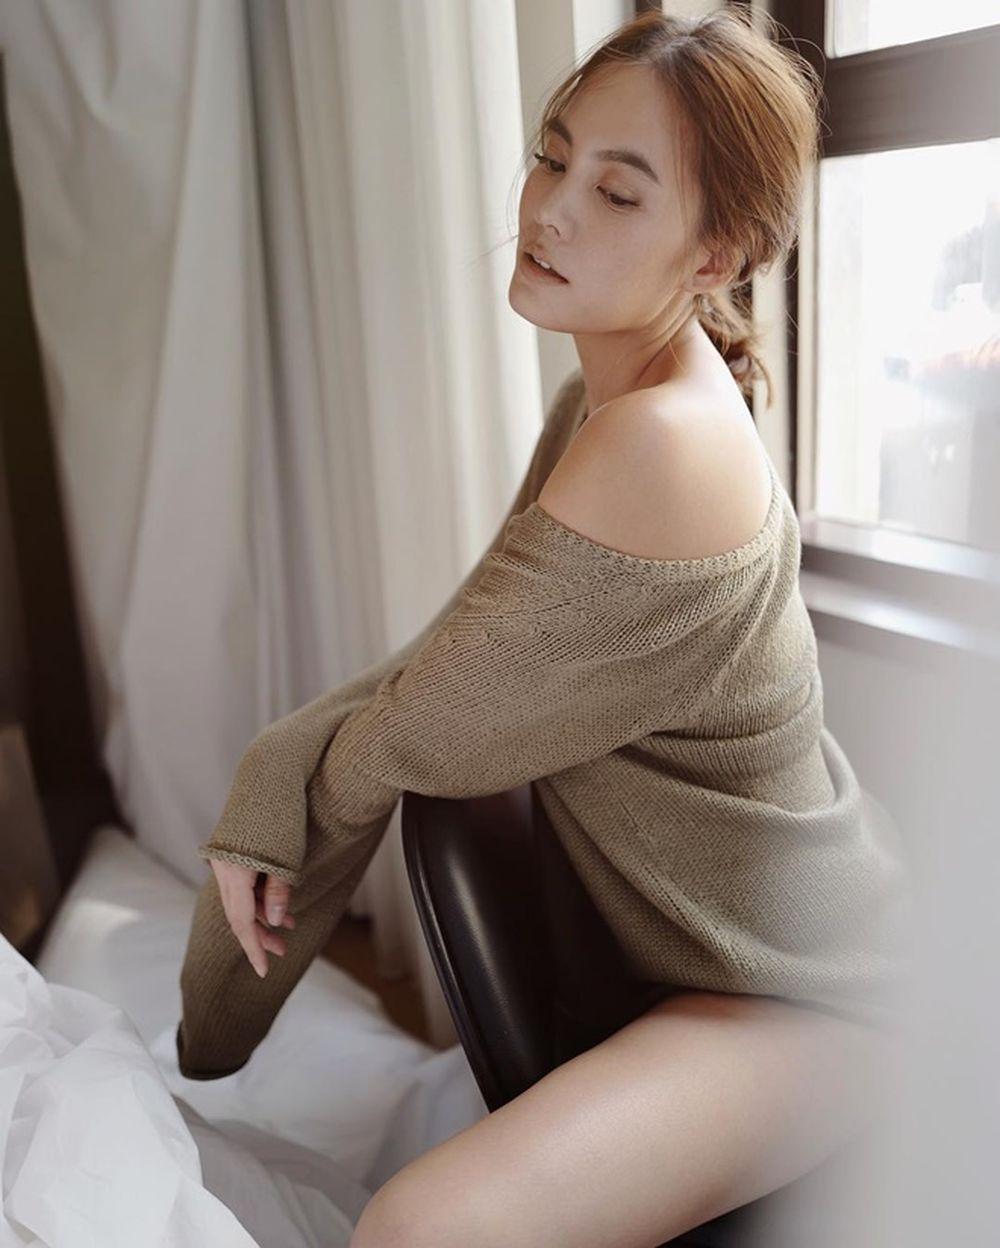 Janie Tienphosuwan nudes (44 photo), Tits, Paparazzi, Twitter, swimsuit 2019